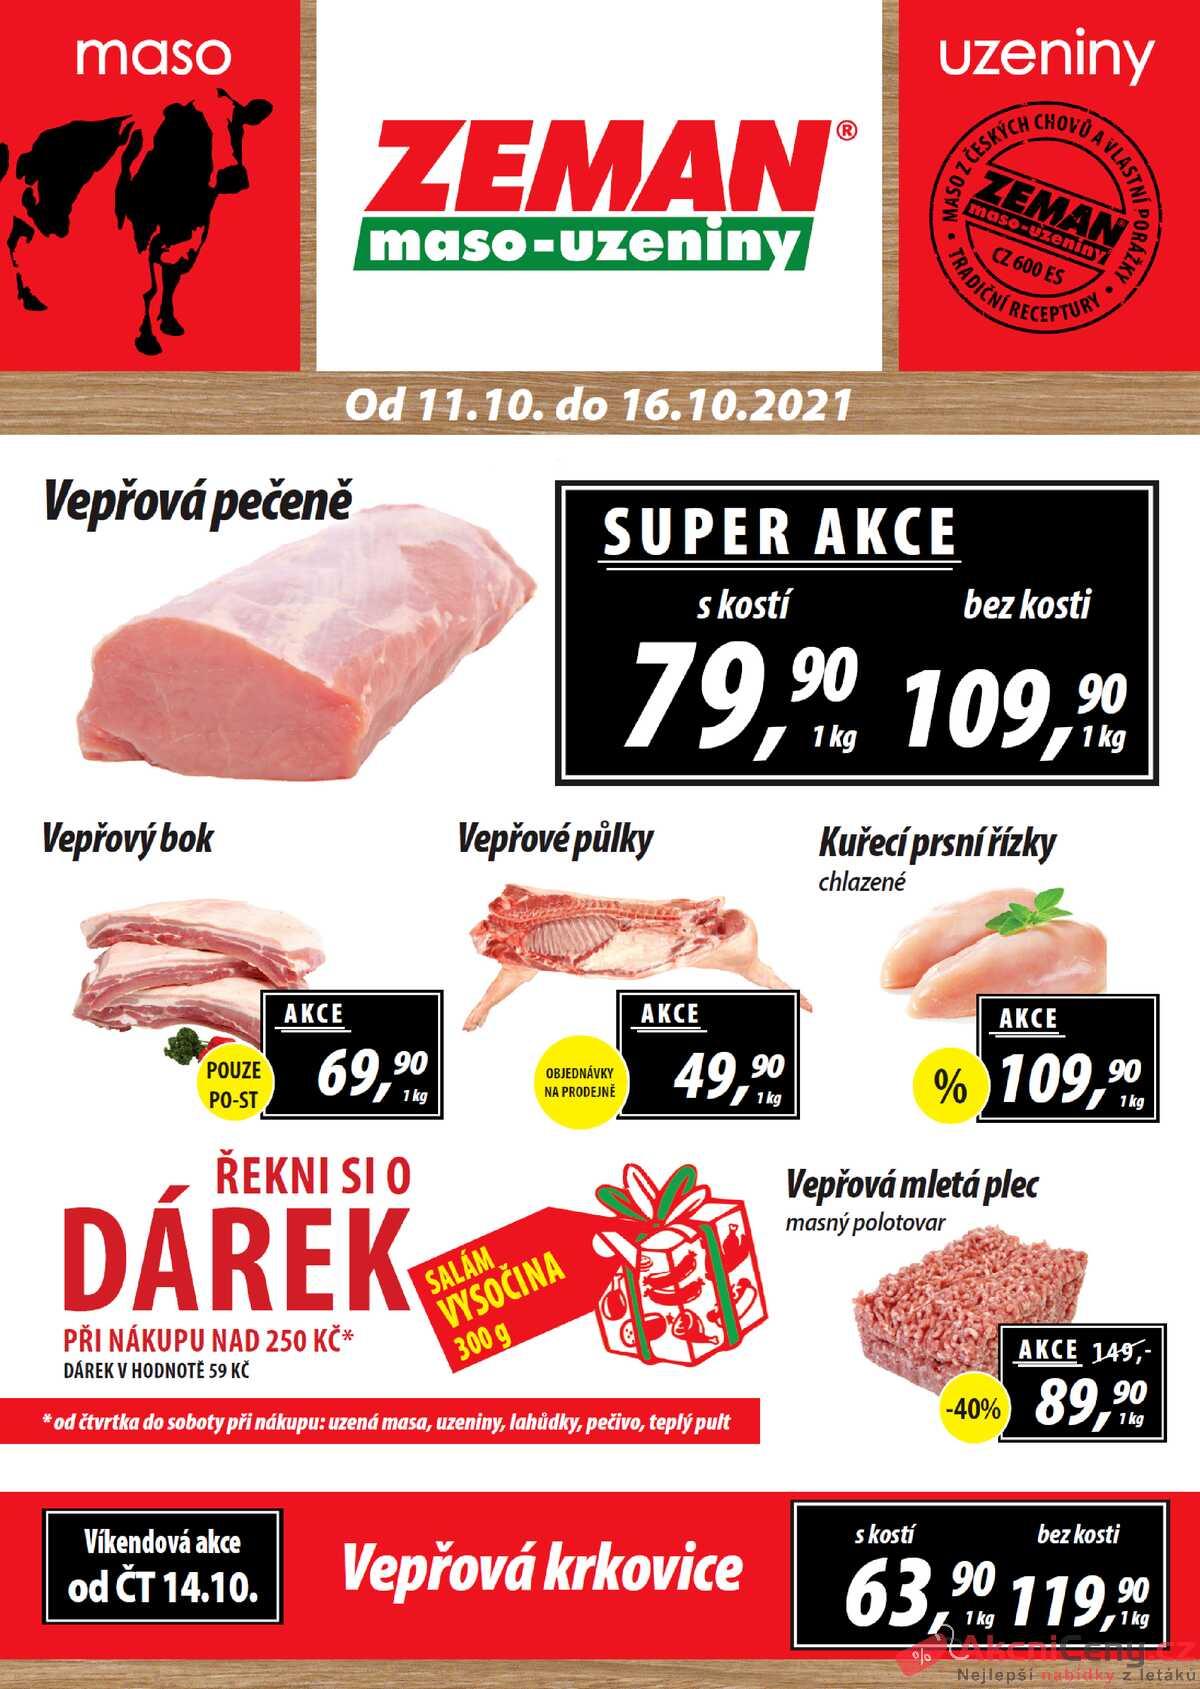 Leták ZEMAN maso-uzeniny strana 1/2